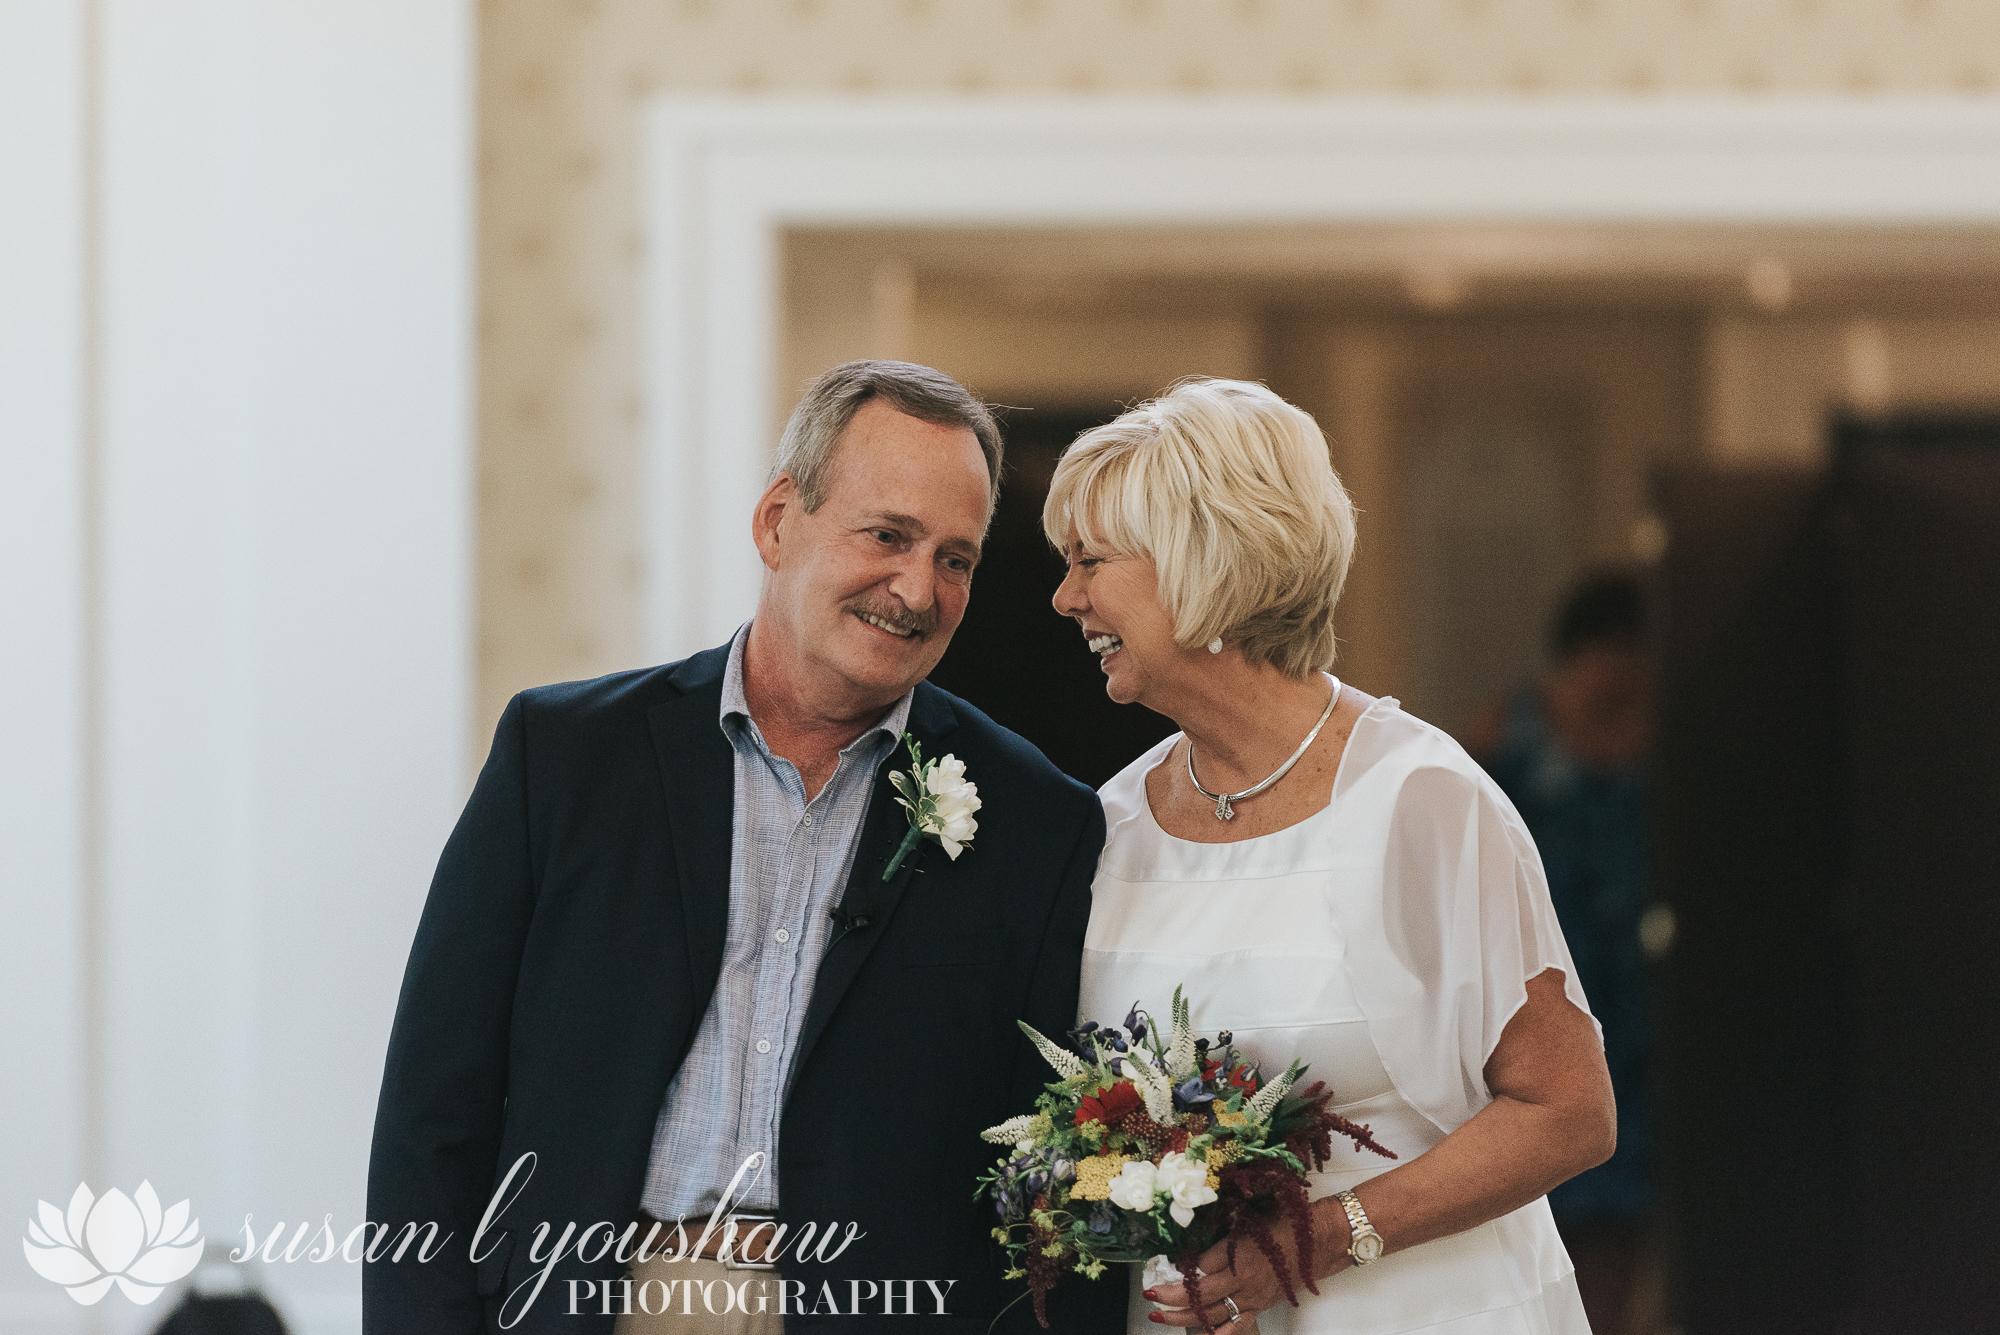 BLOG Carolyn Adams and Jim McCune 07-04-2018 SLY Photography-62.jpg